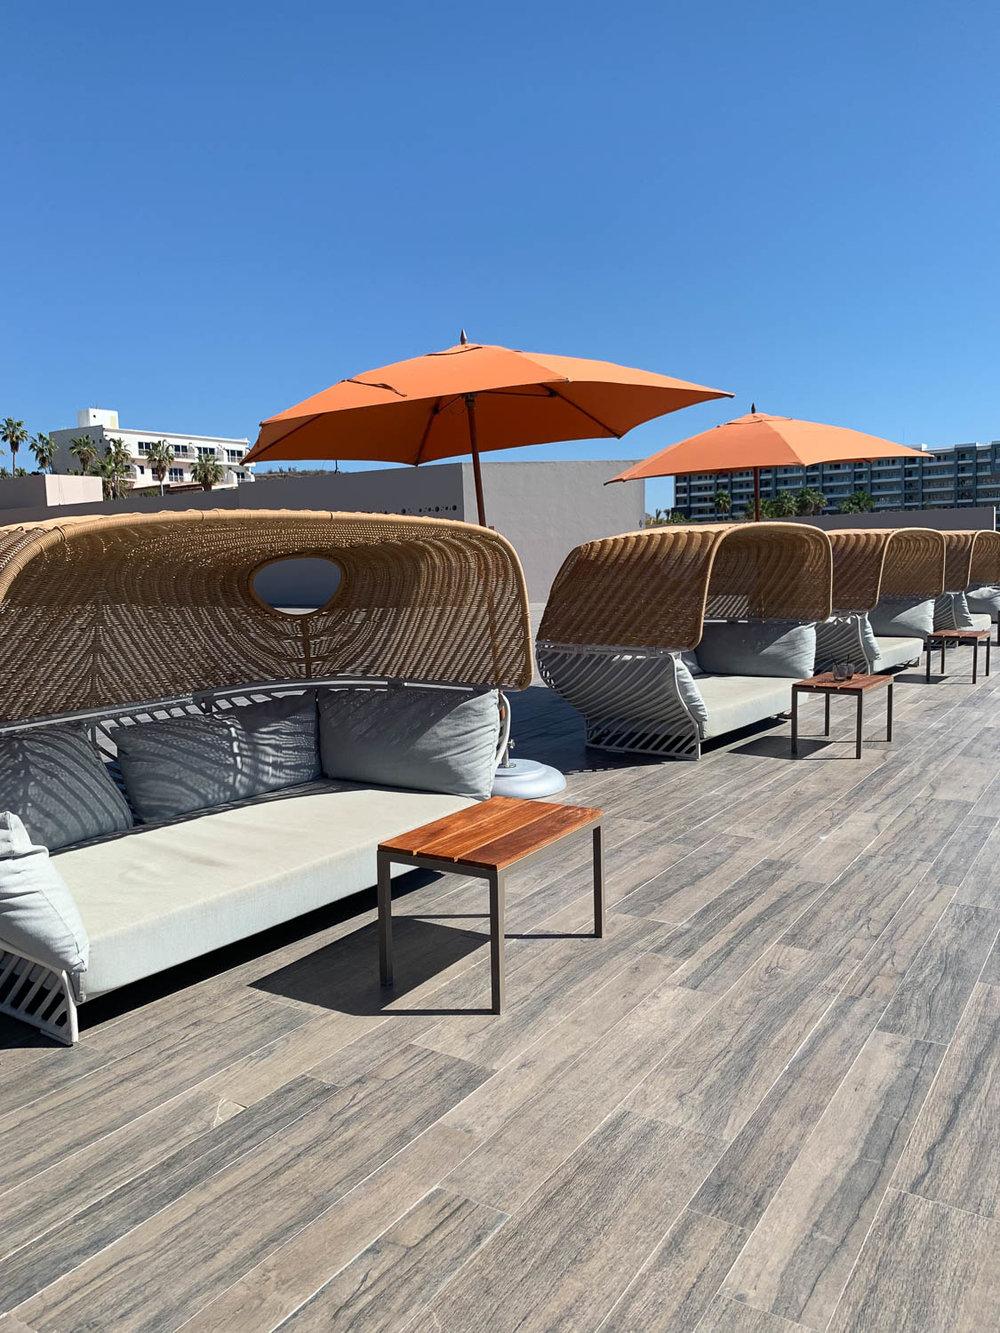 Best All-Inclusive Resort - Cabo All Inclusive Resort - Cabo Resort-5746.jpg